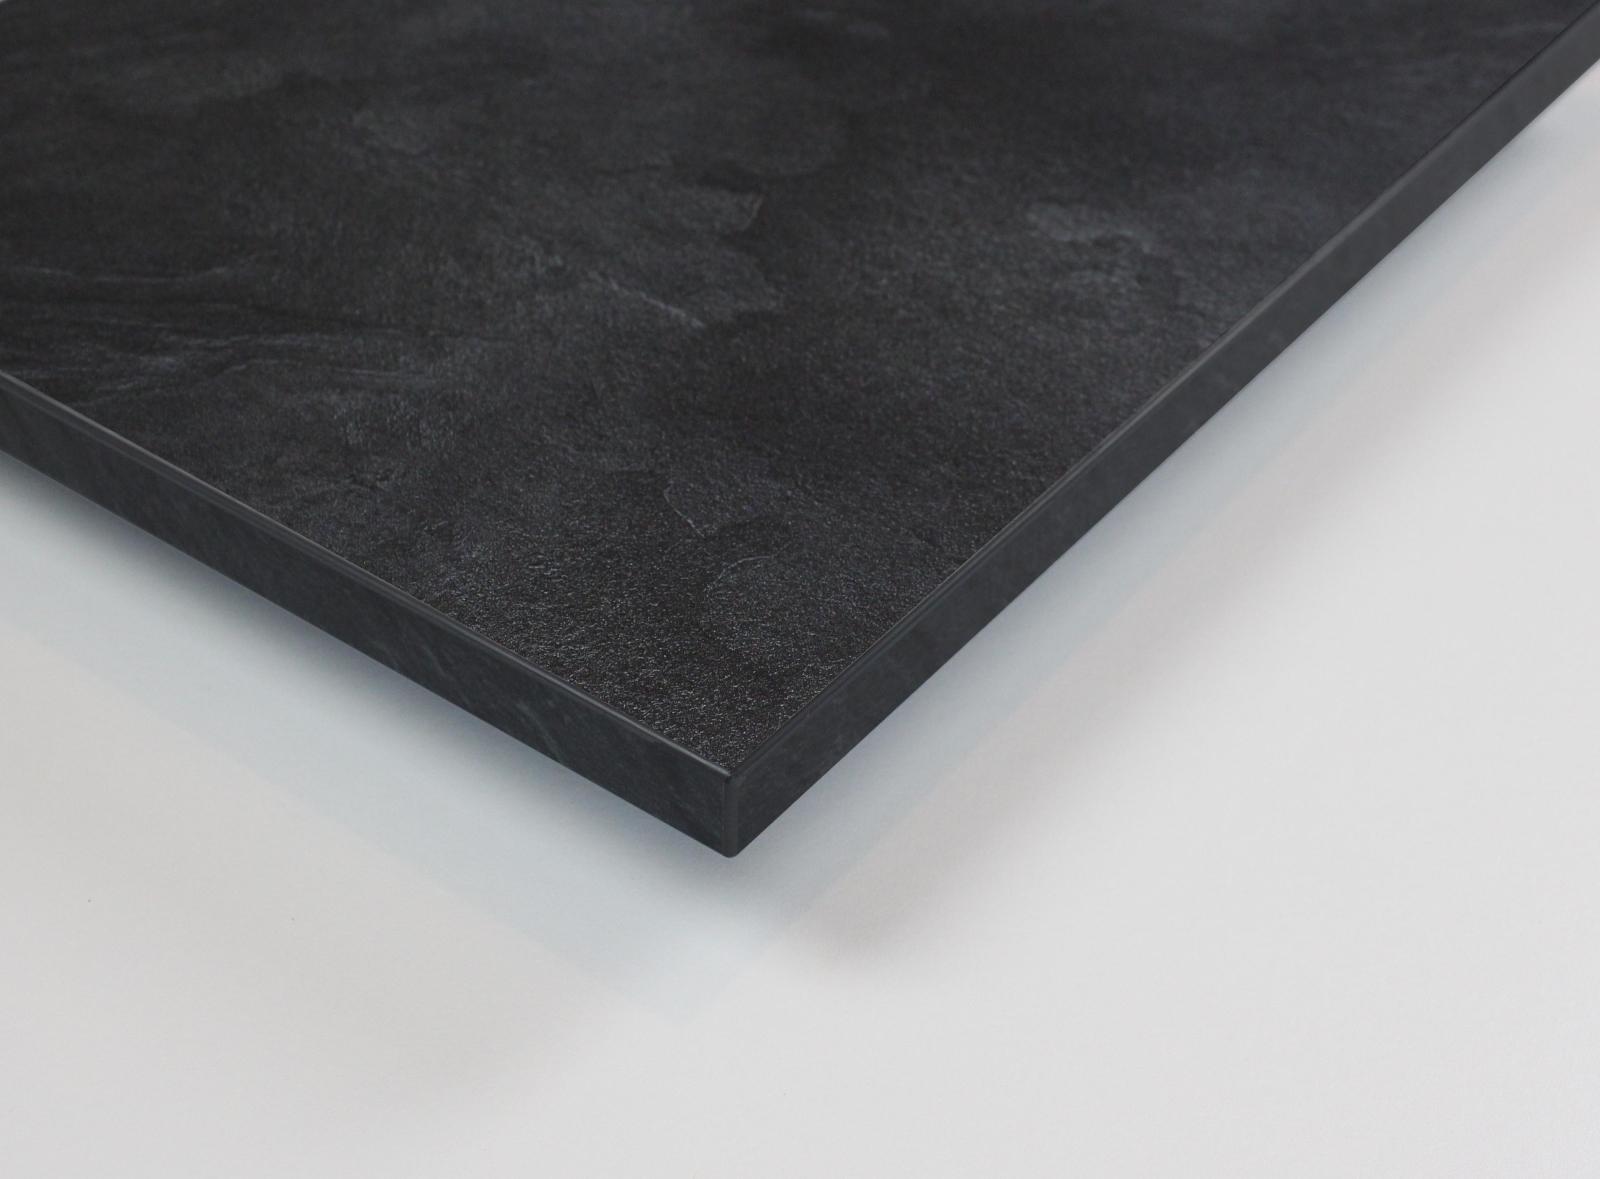 dekorholz schiefer holzzuschnitt. Black Bedroom Furniture Sets. Home Design Ideas